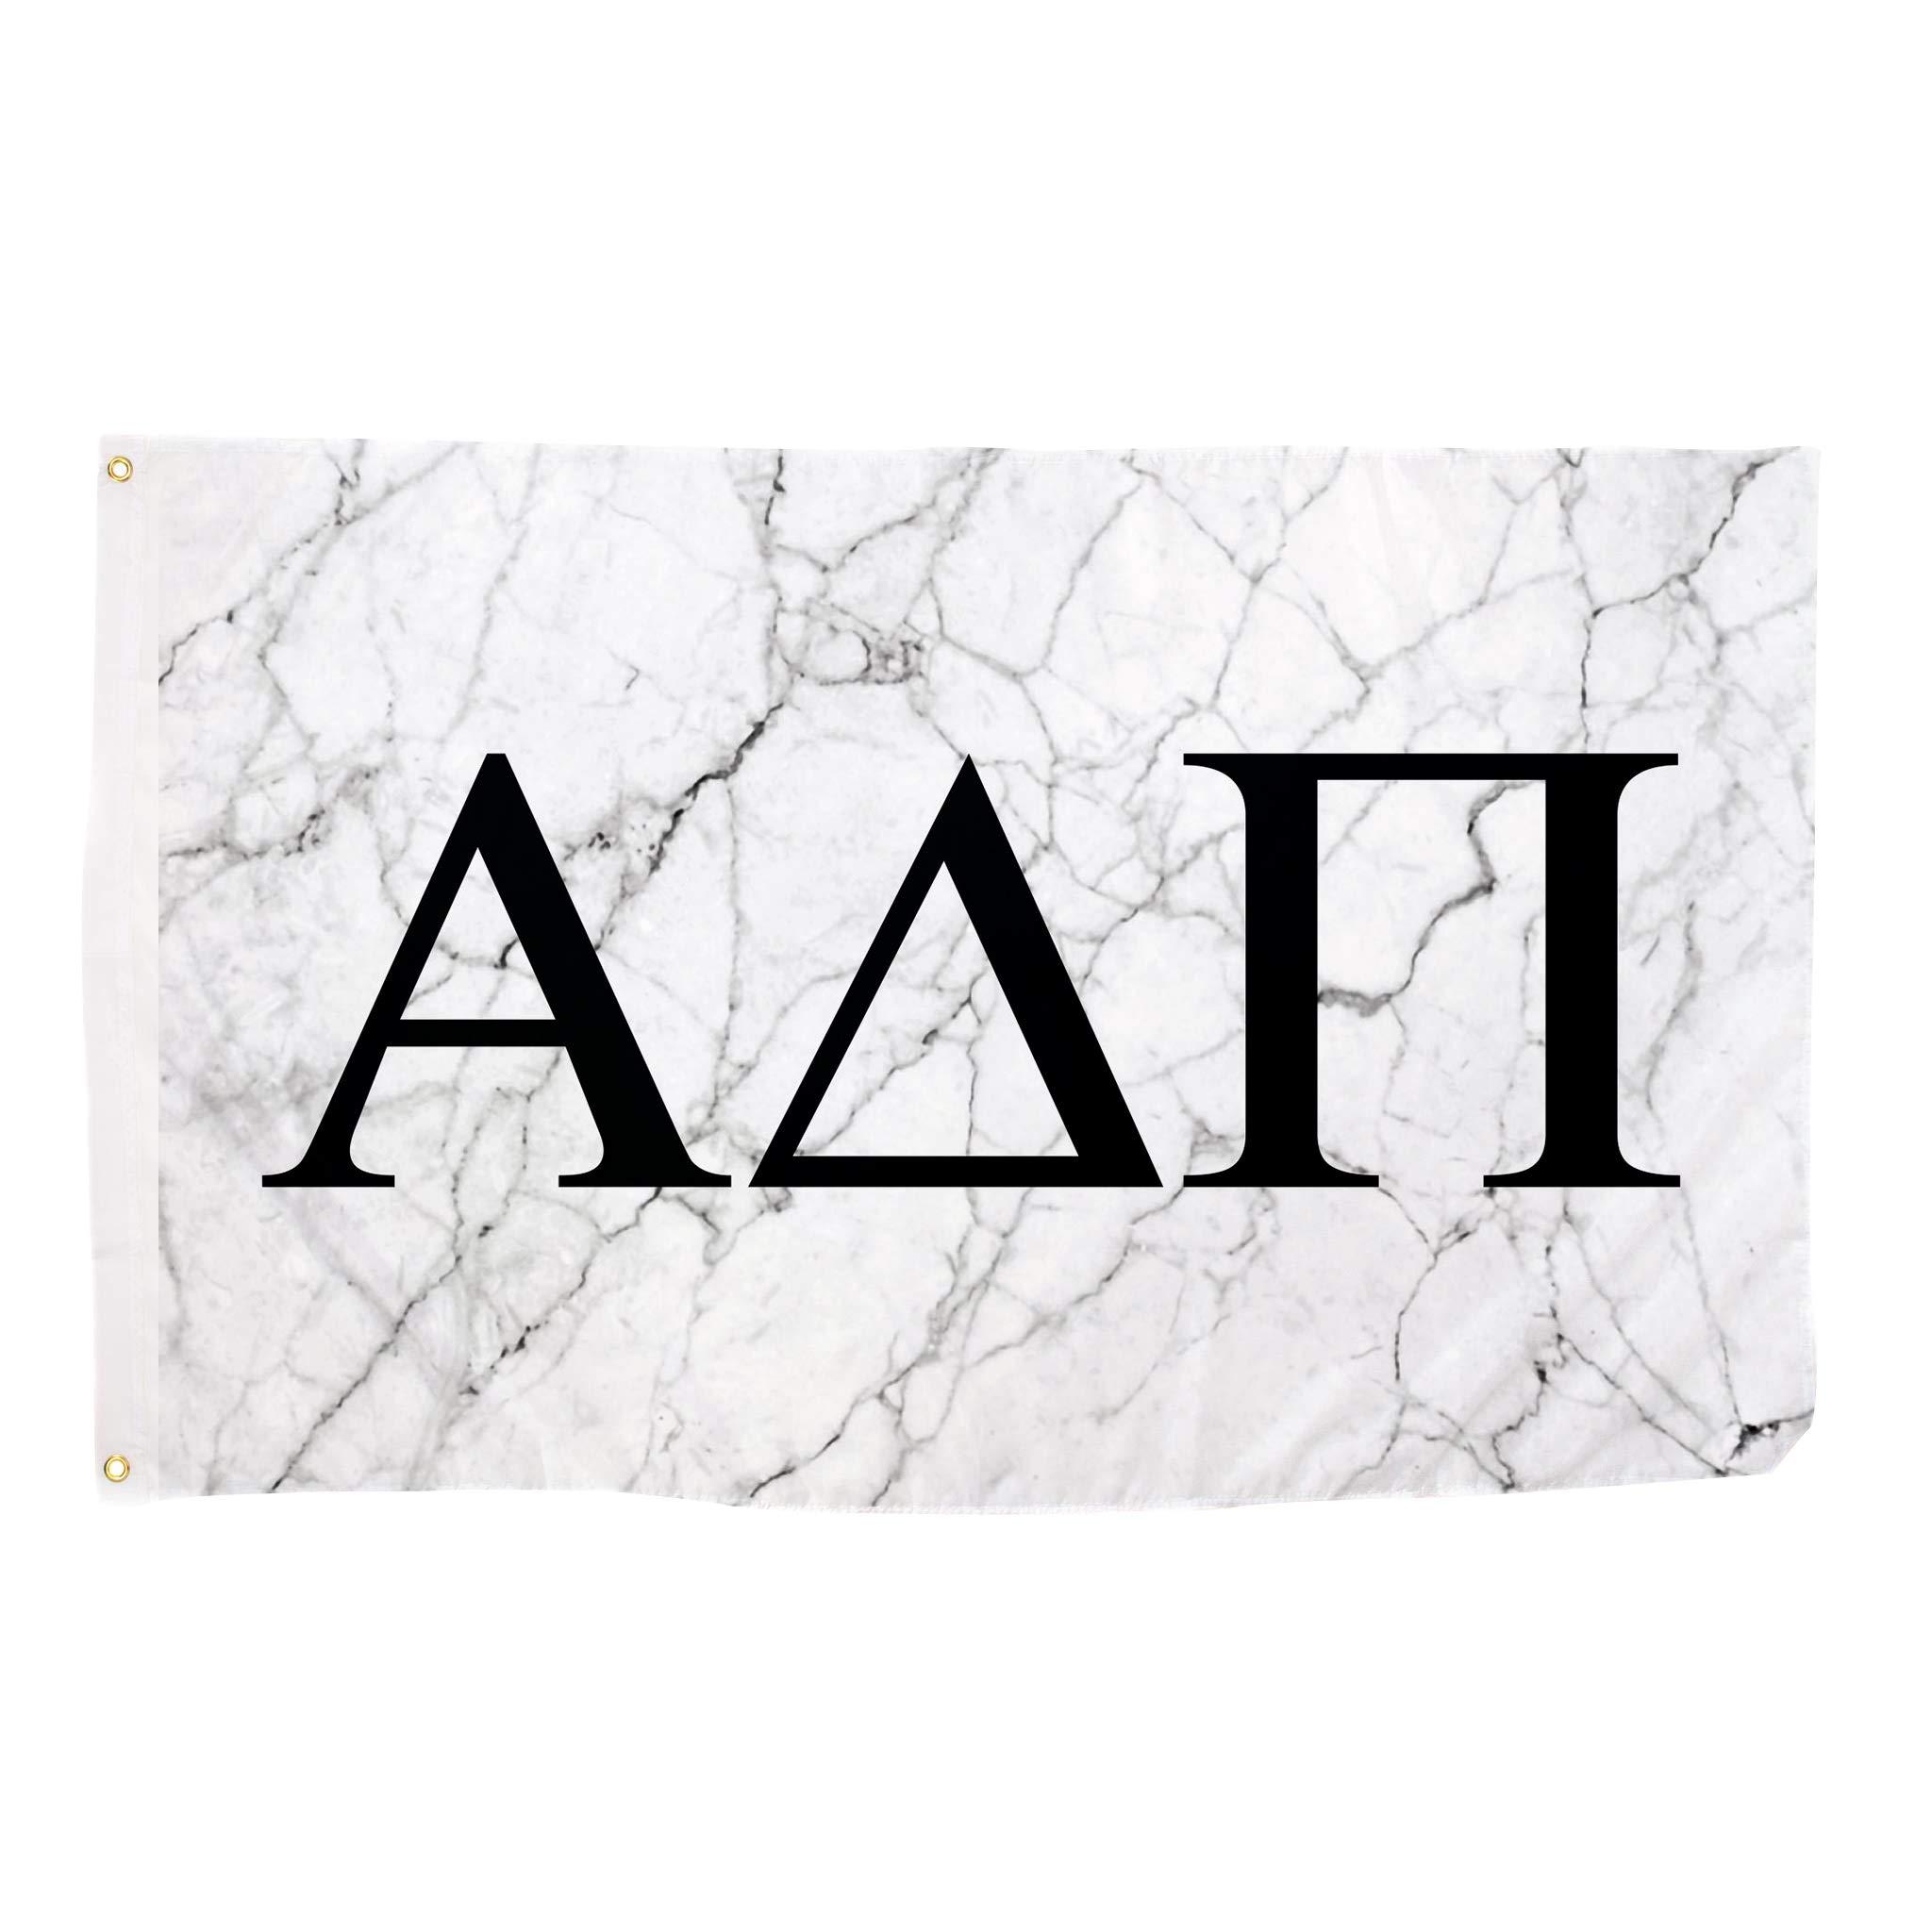 Alpha Delta Pi Light Marble Sorority Letter Flag Banner Sign Decor ADPi